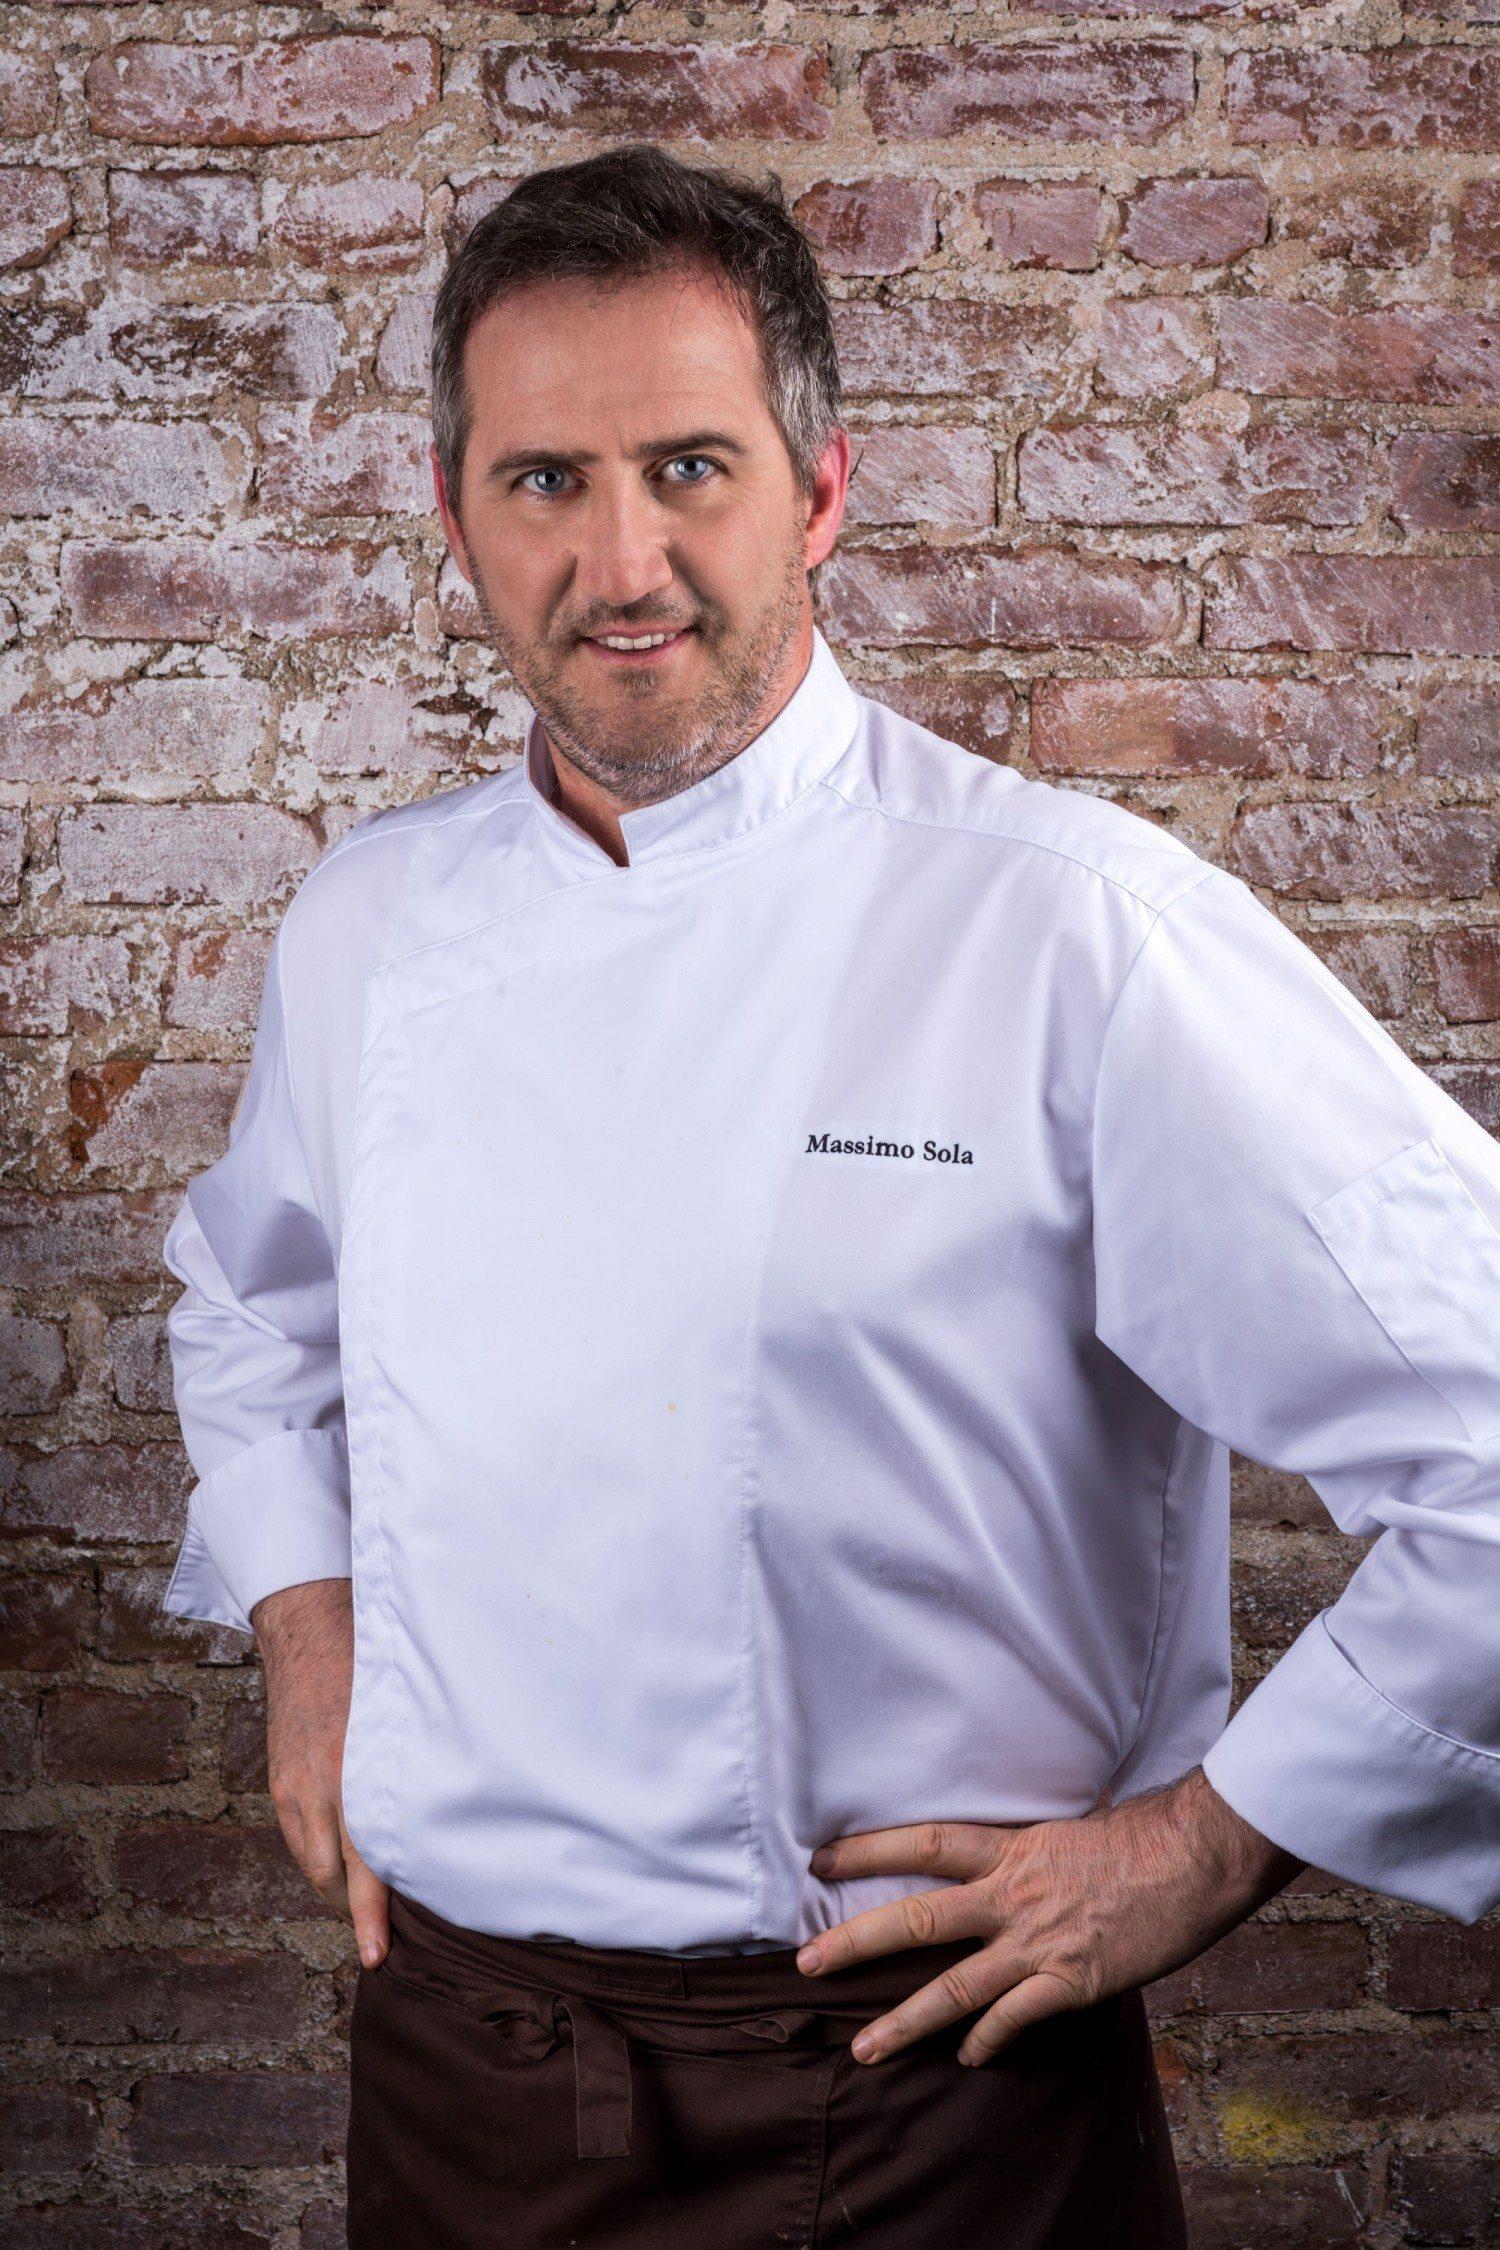 Chef Massimo Sola - photo by Enrique Shore